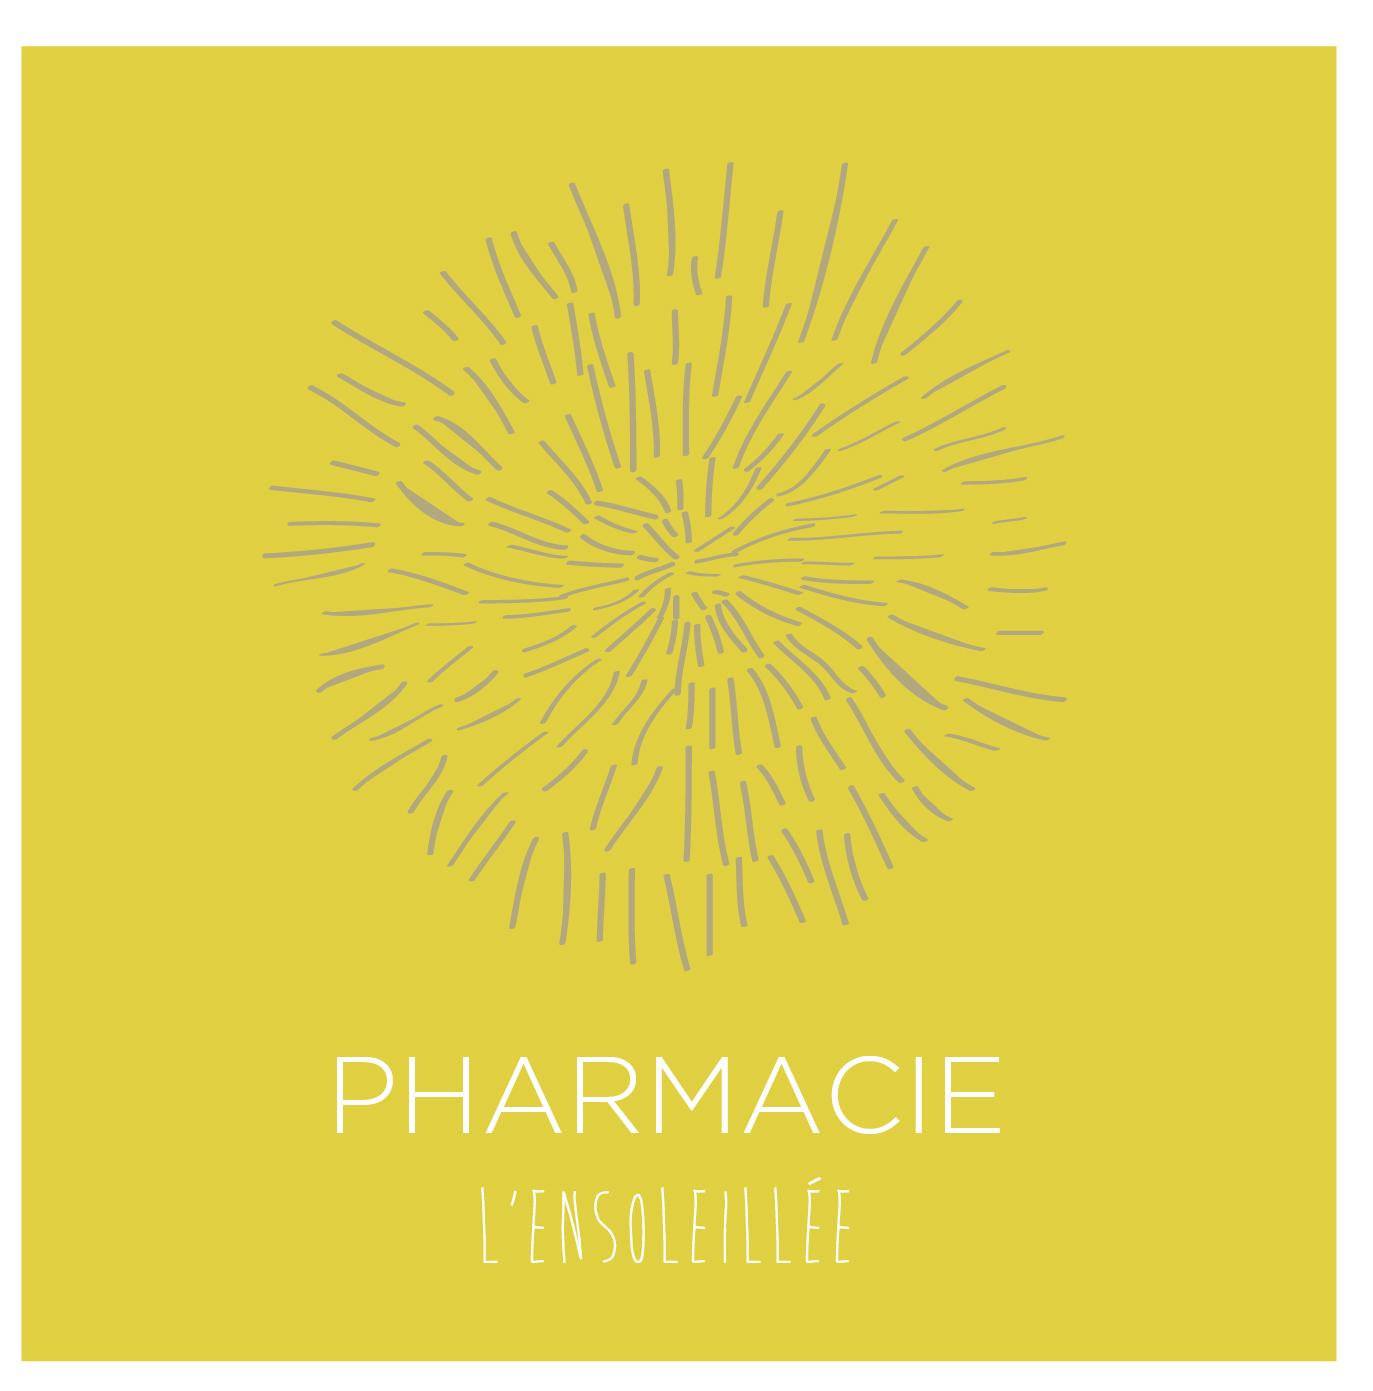 PHARMACIE L'ENSOLEILLEE –  AIX EN PROVENCE (13) 31